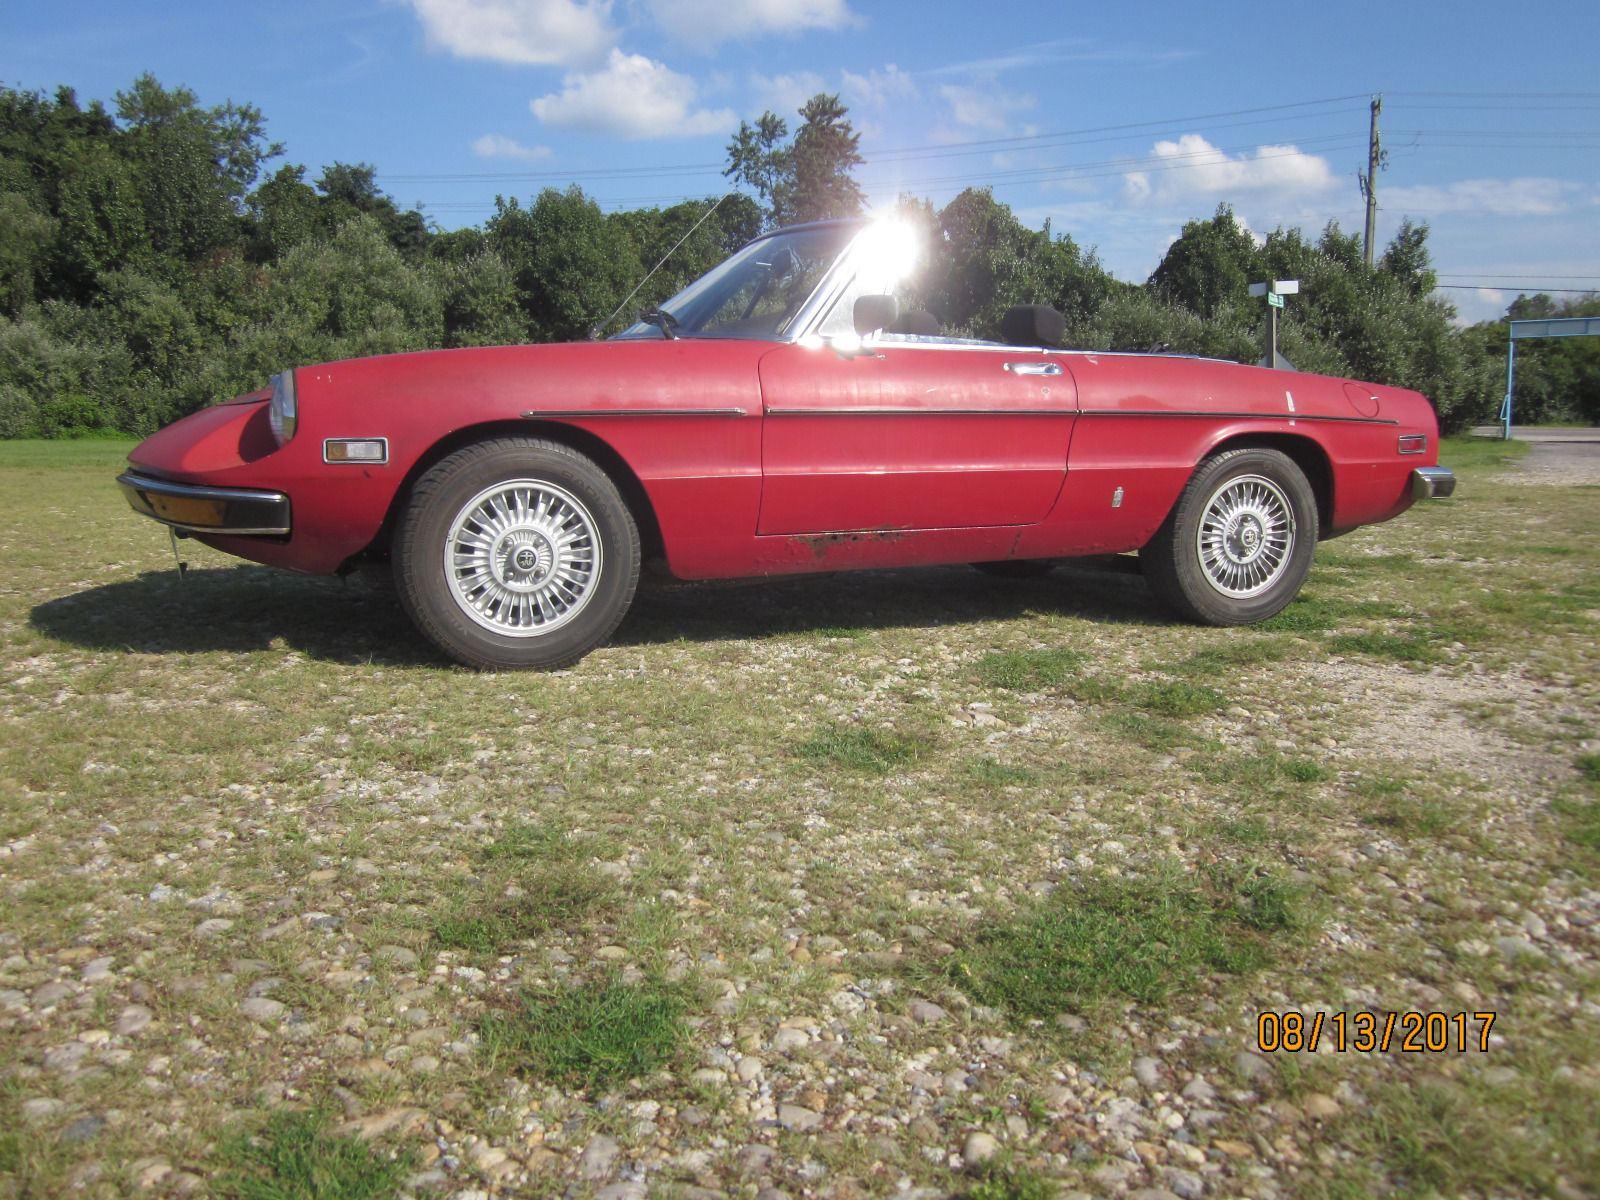 Alfa Romeo Spider With Thin Blade Turbina Wheels For Sale on Alfa Romeo Spider Rear Suspension